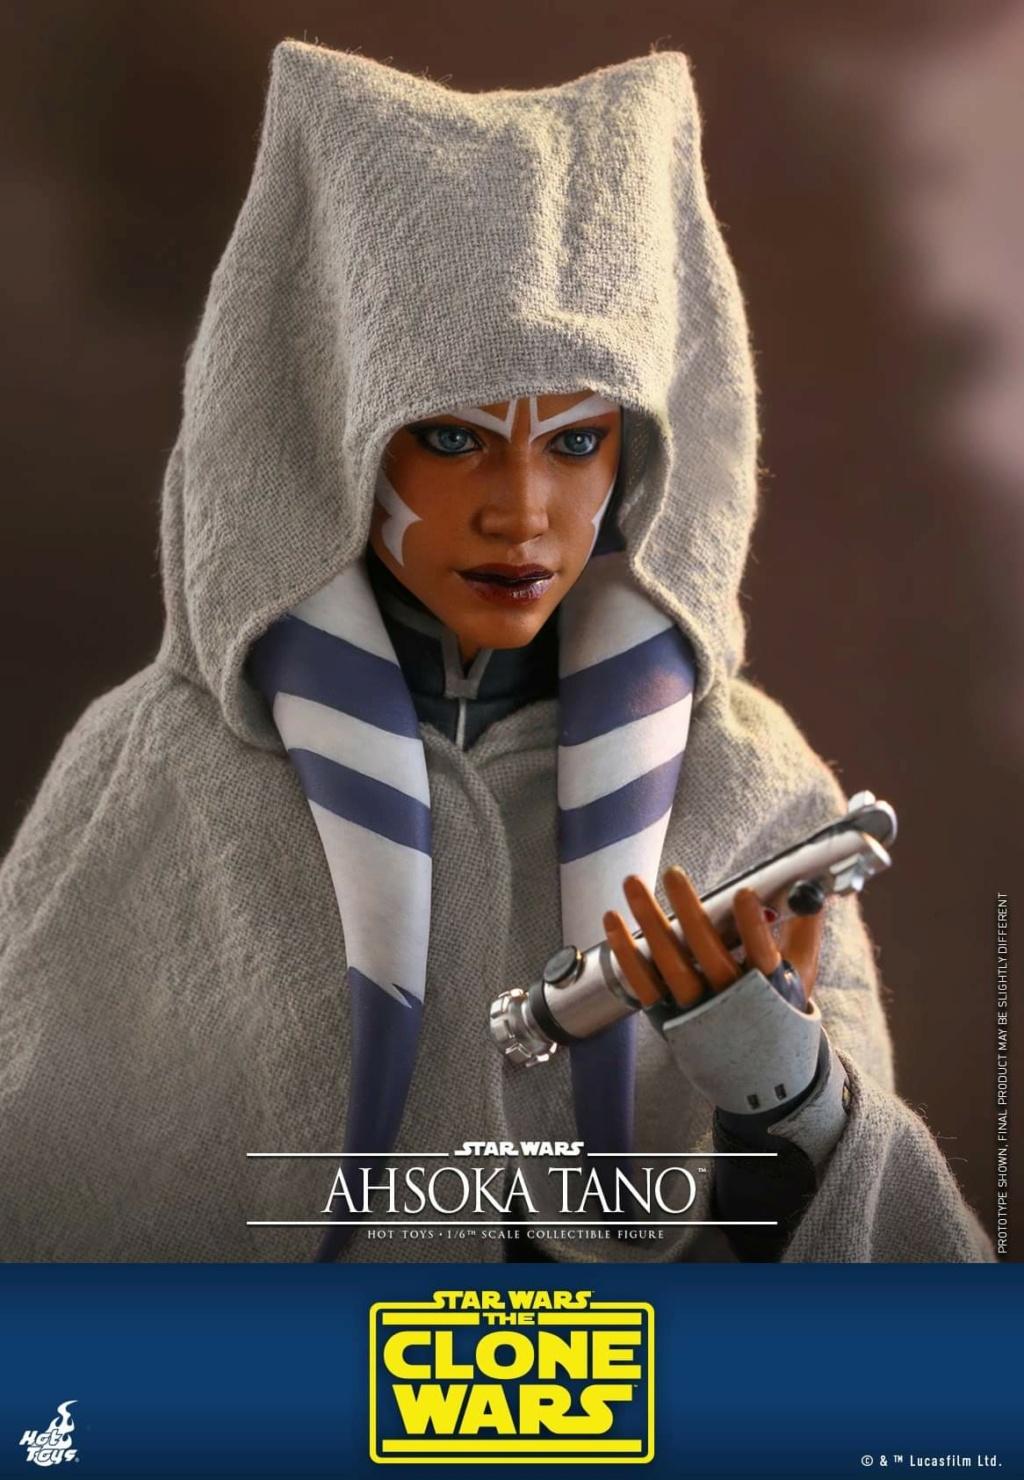 Ahsoka Tano - 1/6th scale - The Clone Wars - Hot Toys Fb_im142